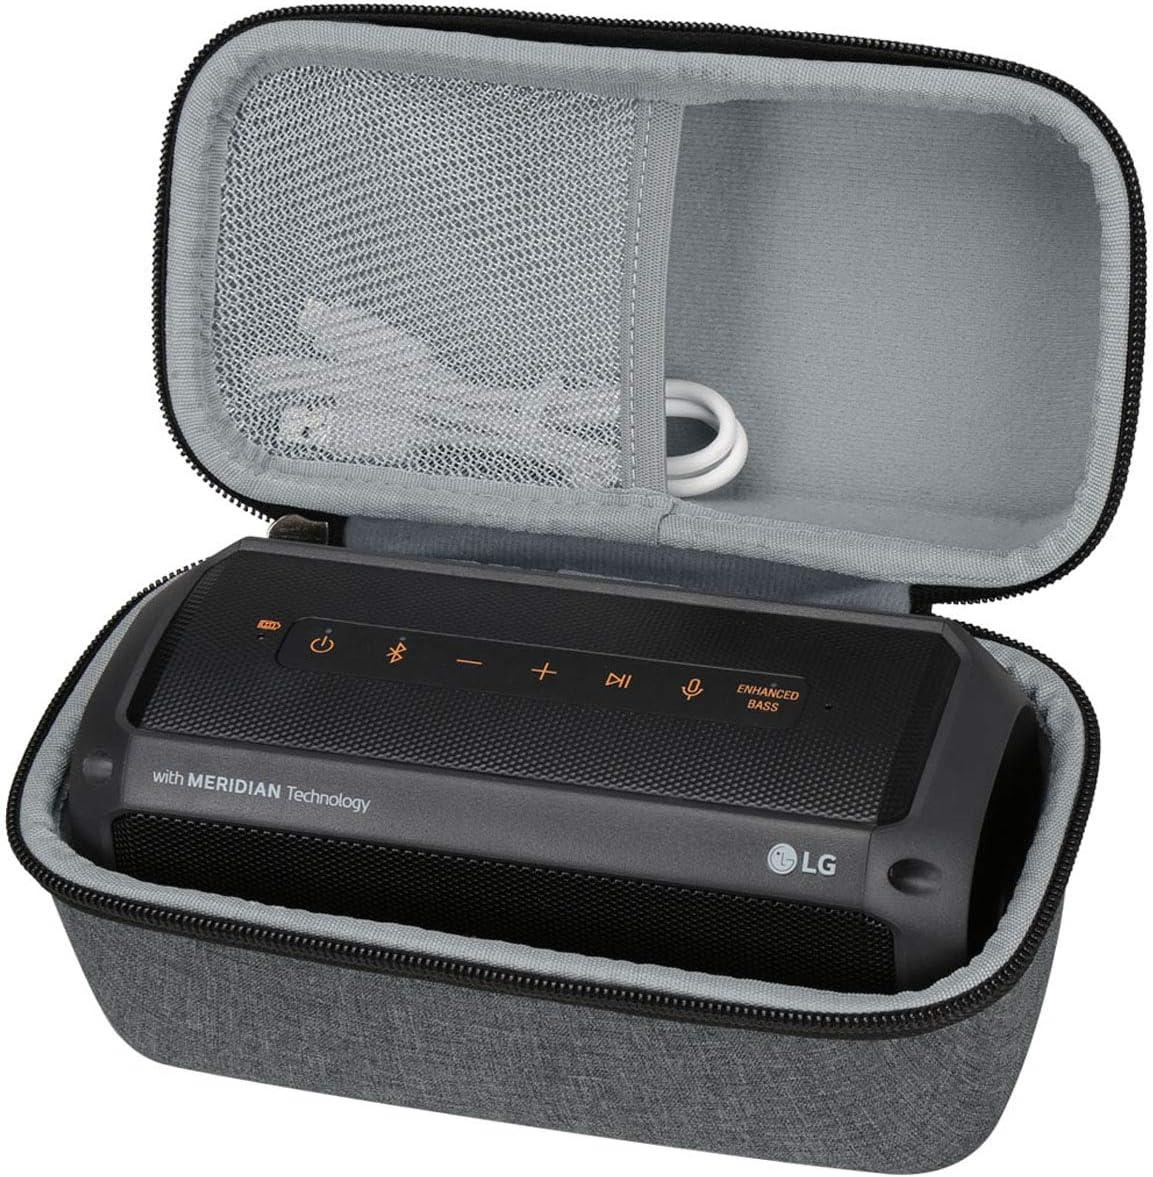 Aproca Duro Viajes Funda Bolso Caso Para LG XBOOM PK3 Altavoz portátil